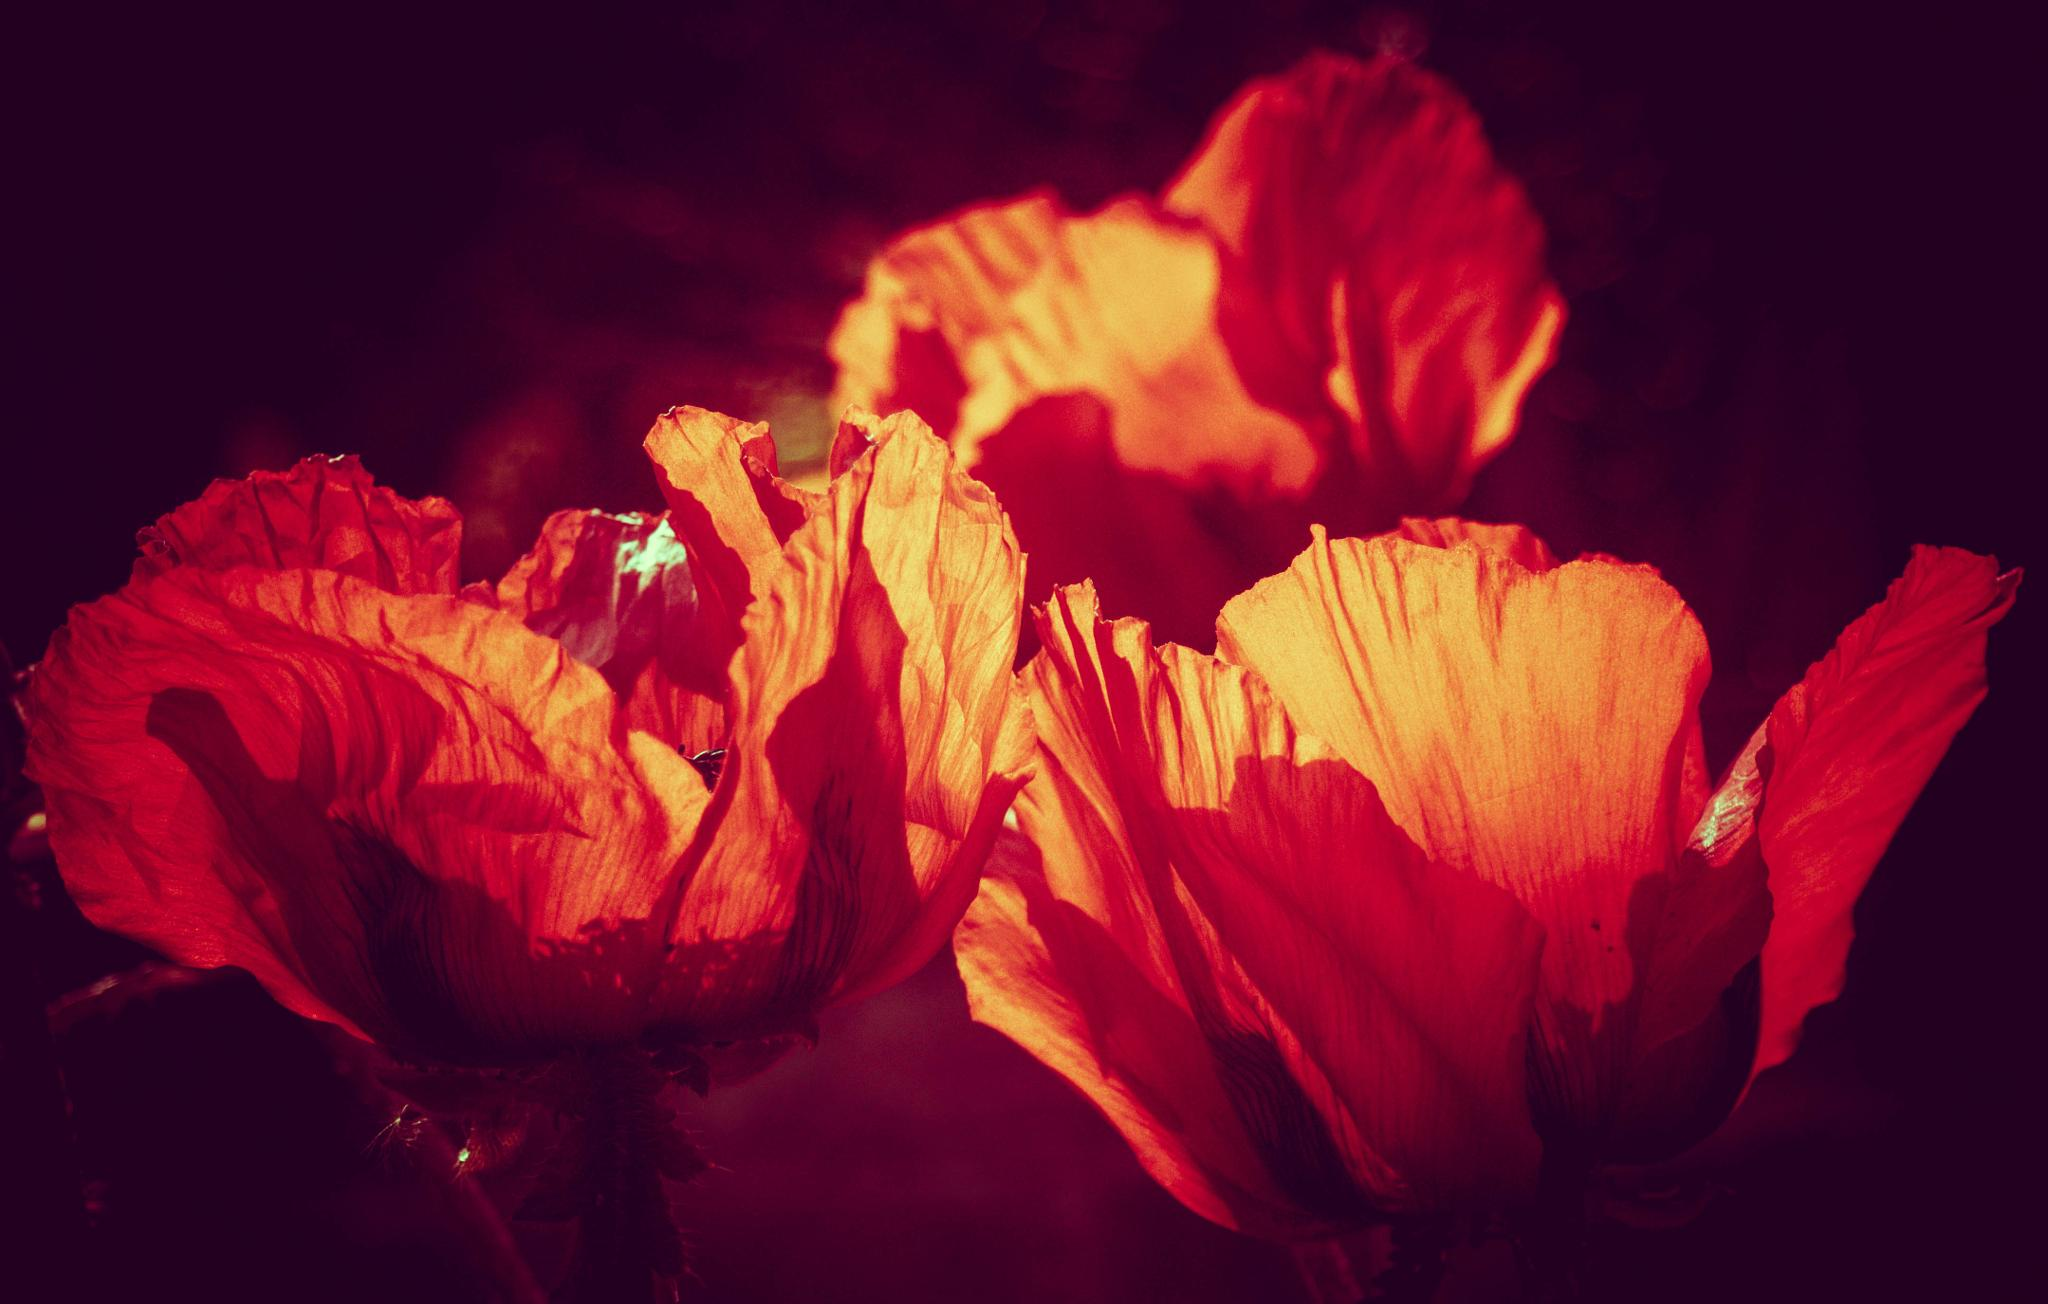 Blazing poppies by Helen Fenner